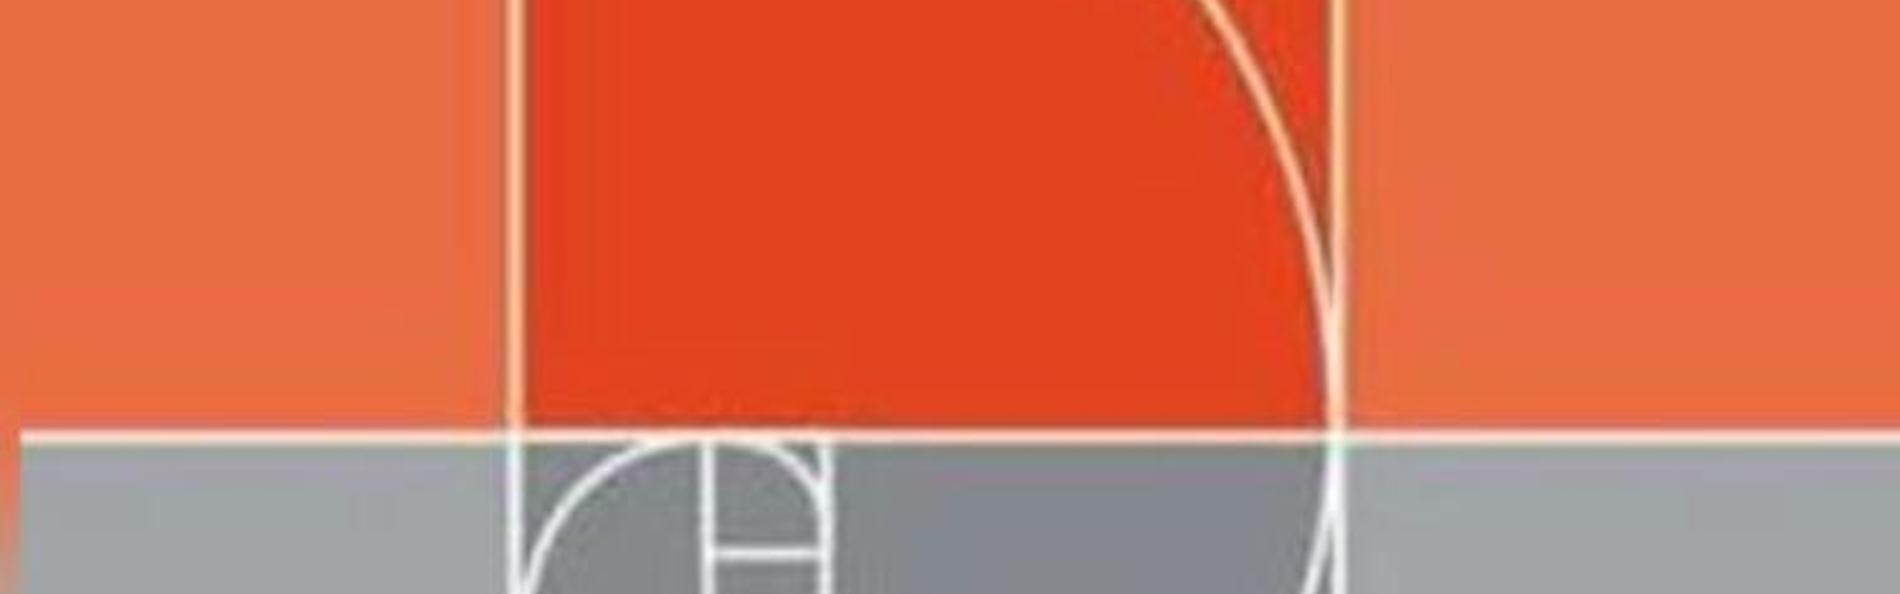 Cl%c3%adnica interface logo profile